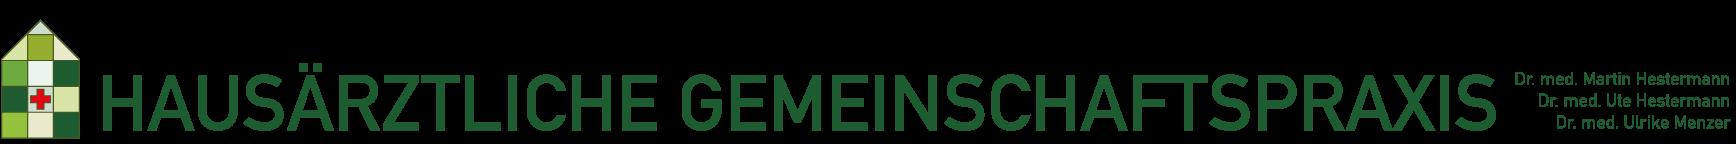 Hausärztliche Gemeinschaftspraxis Drs. Hestermann-Menzer